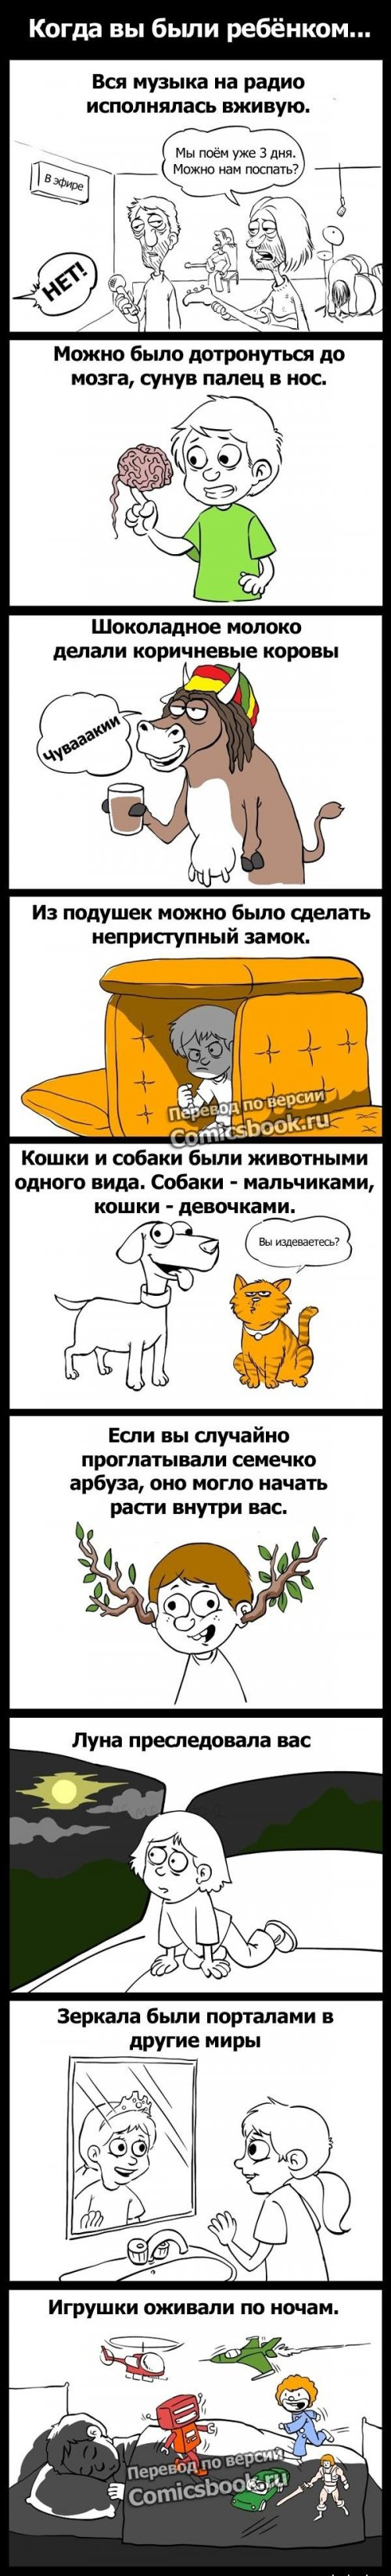 http://www.bugaga.ru/uploads/posts/2012-11/thumbs/1352985495_komixi.jpg